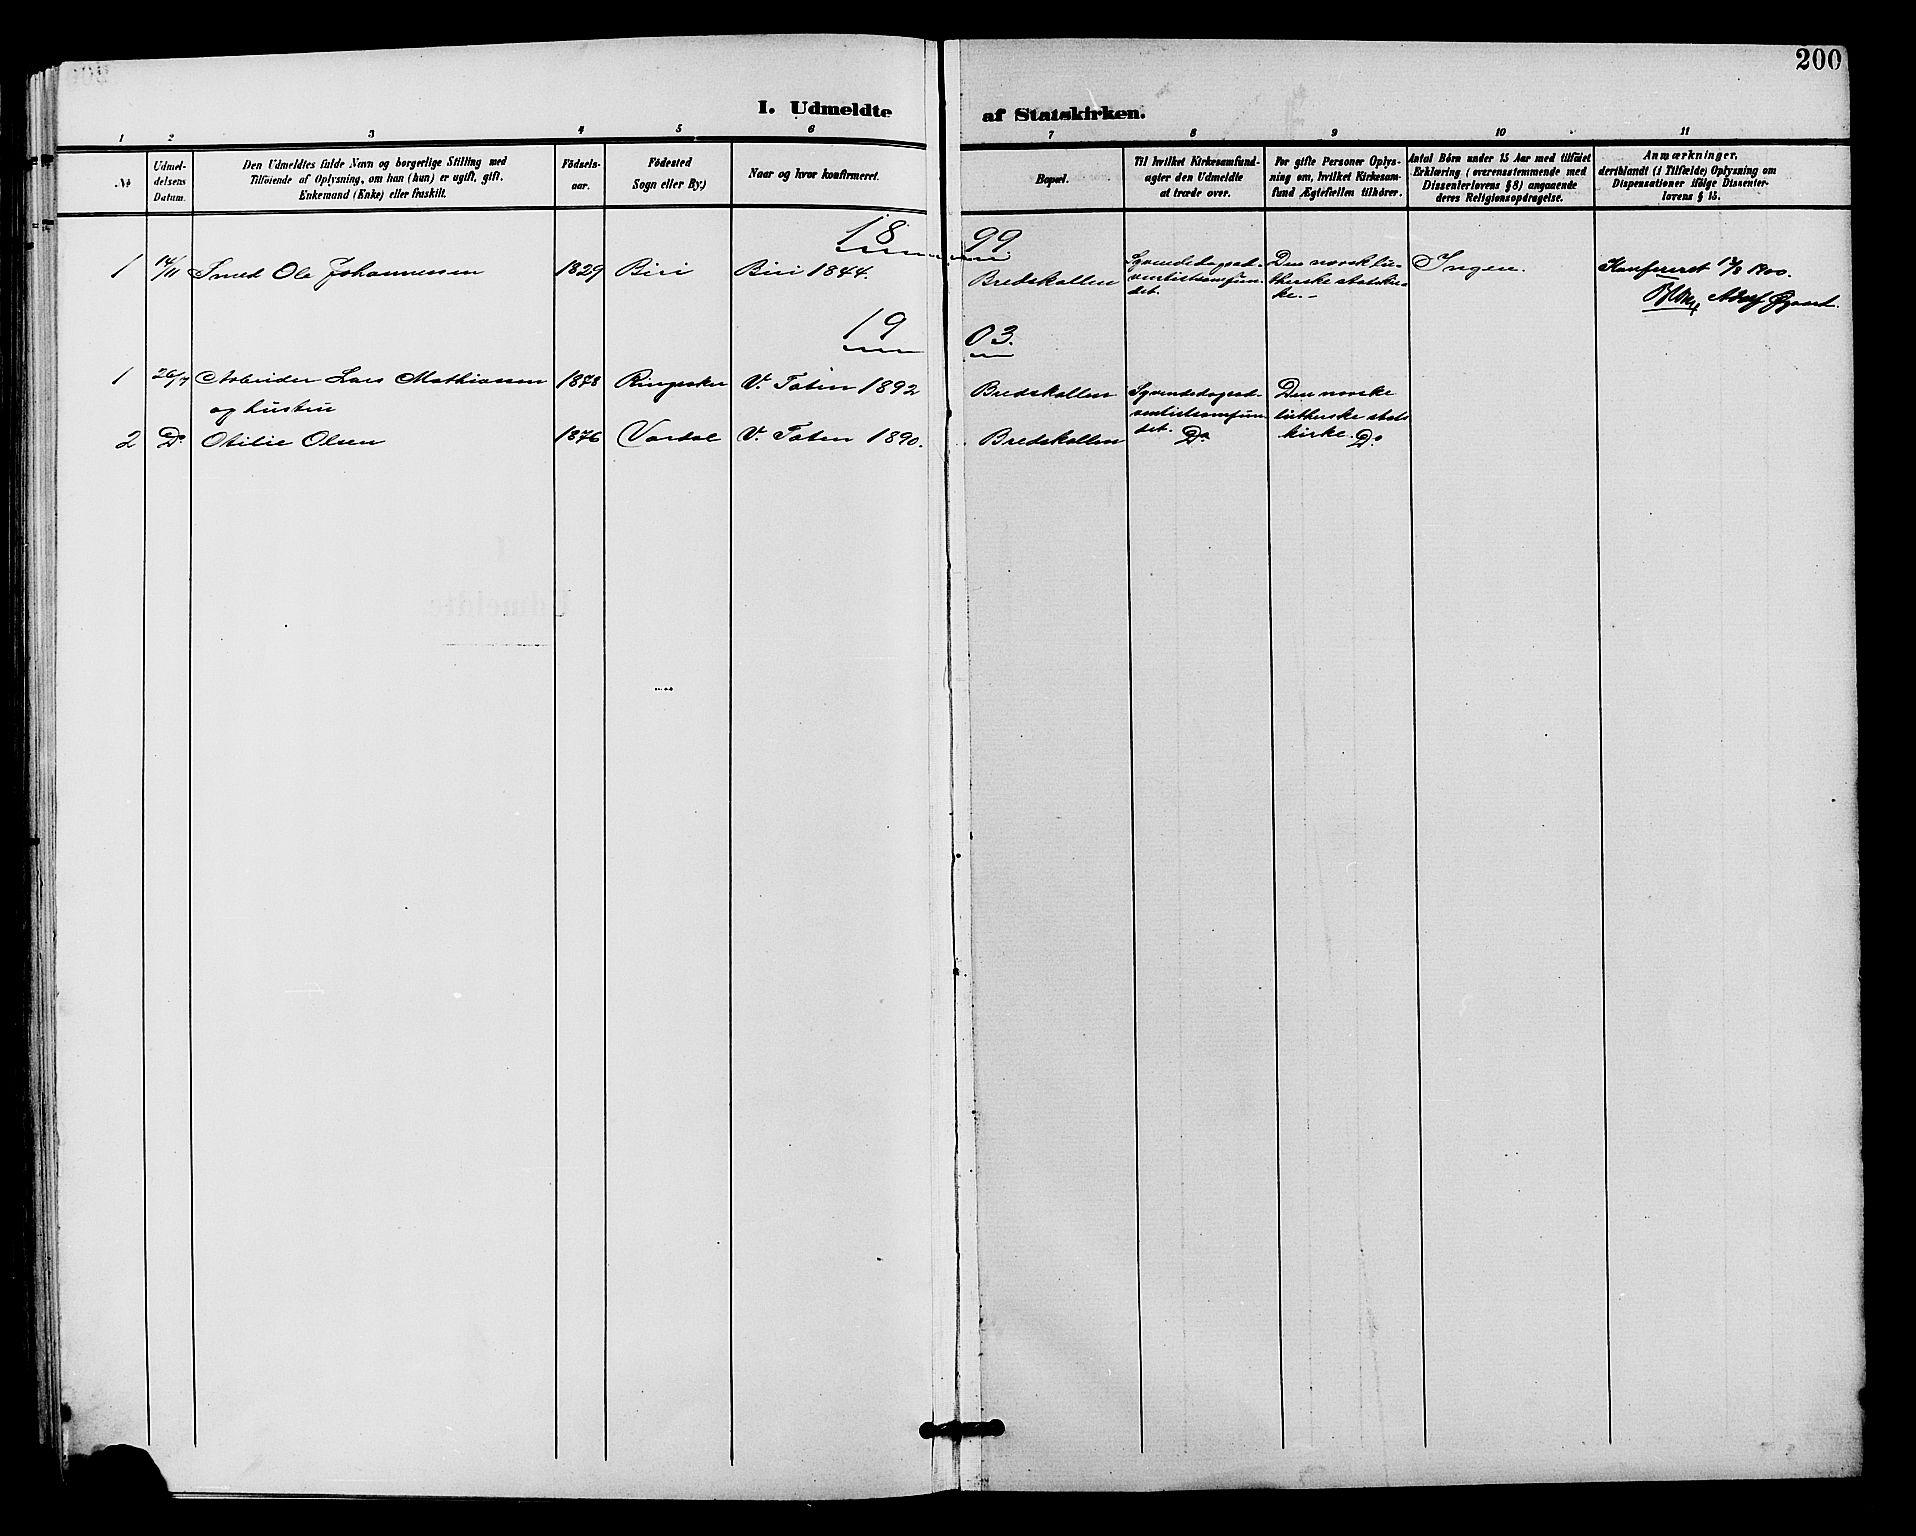 SAH, Vardal prestekontor, H/Ha/Hab/L0011: Klokkerbok nr. 11, 1899-1913, s. 200